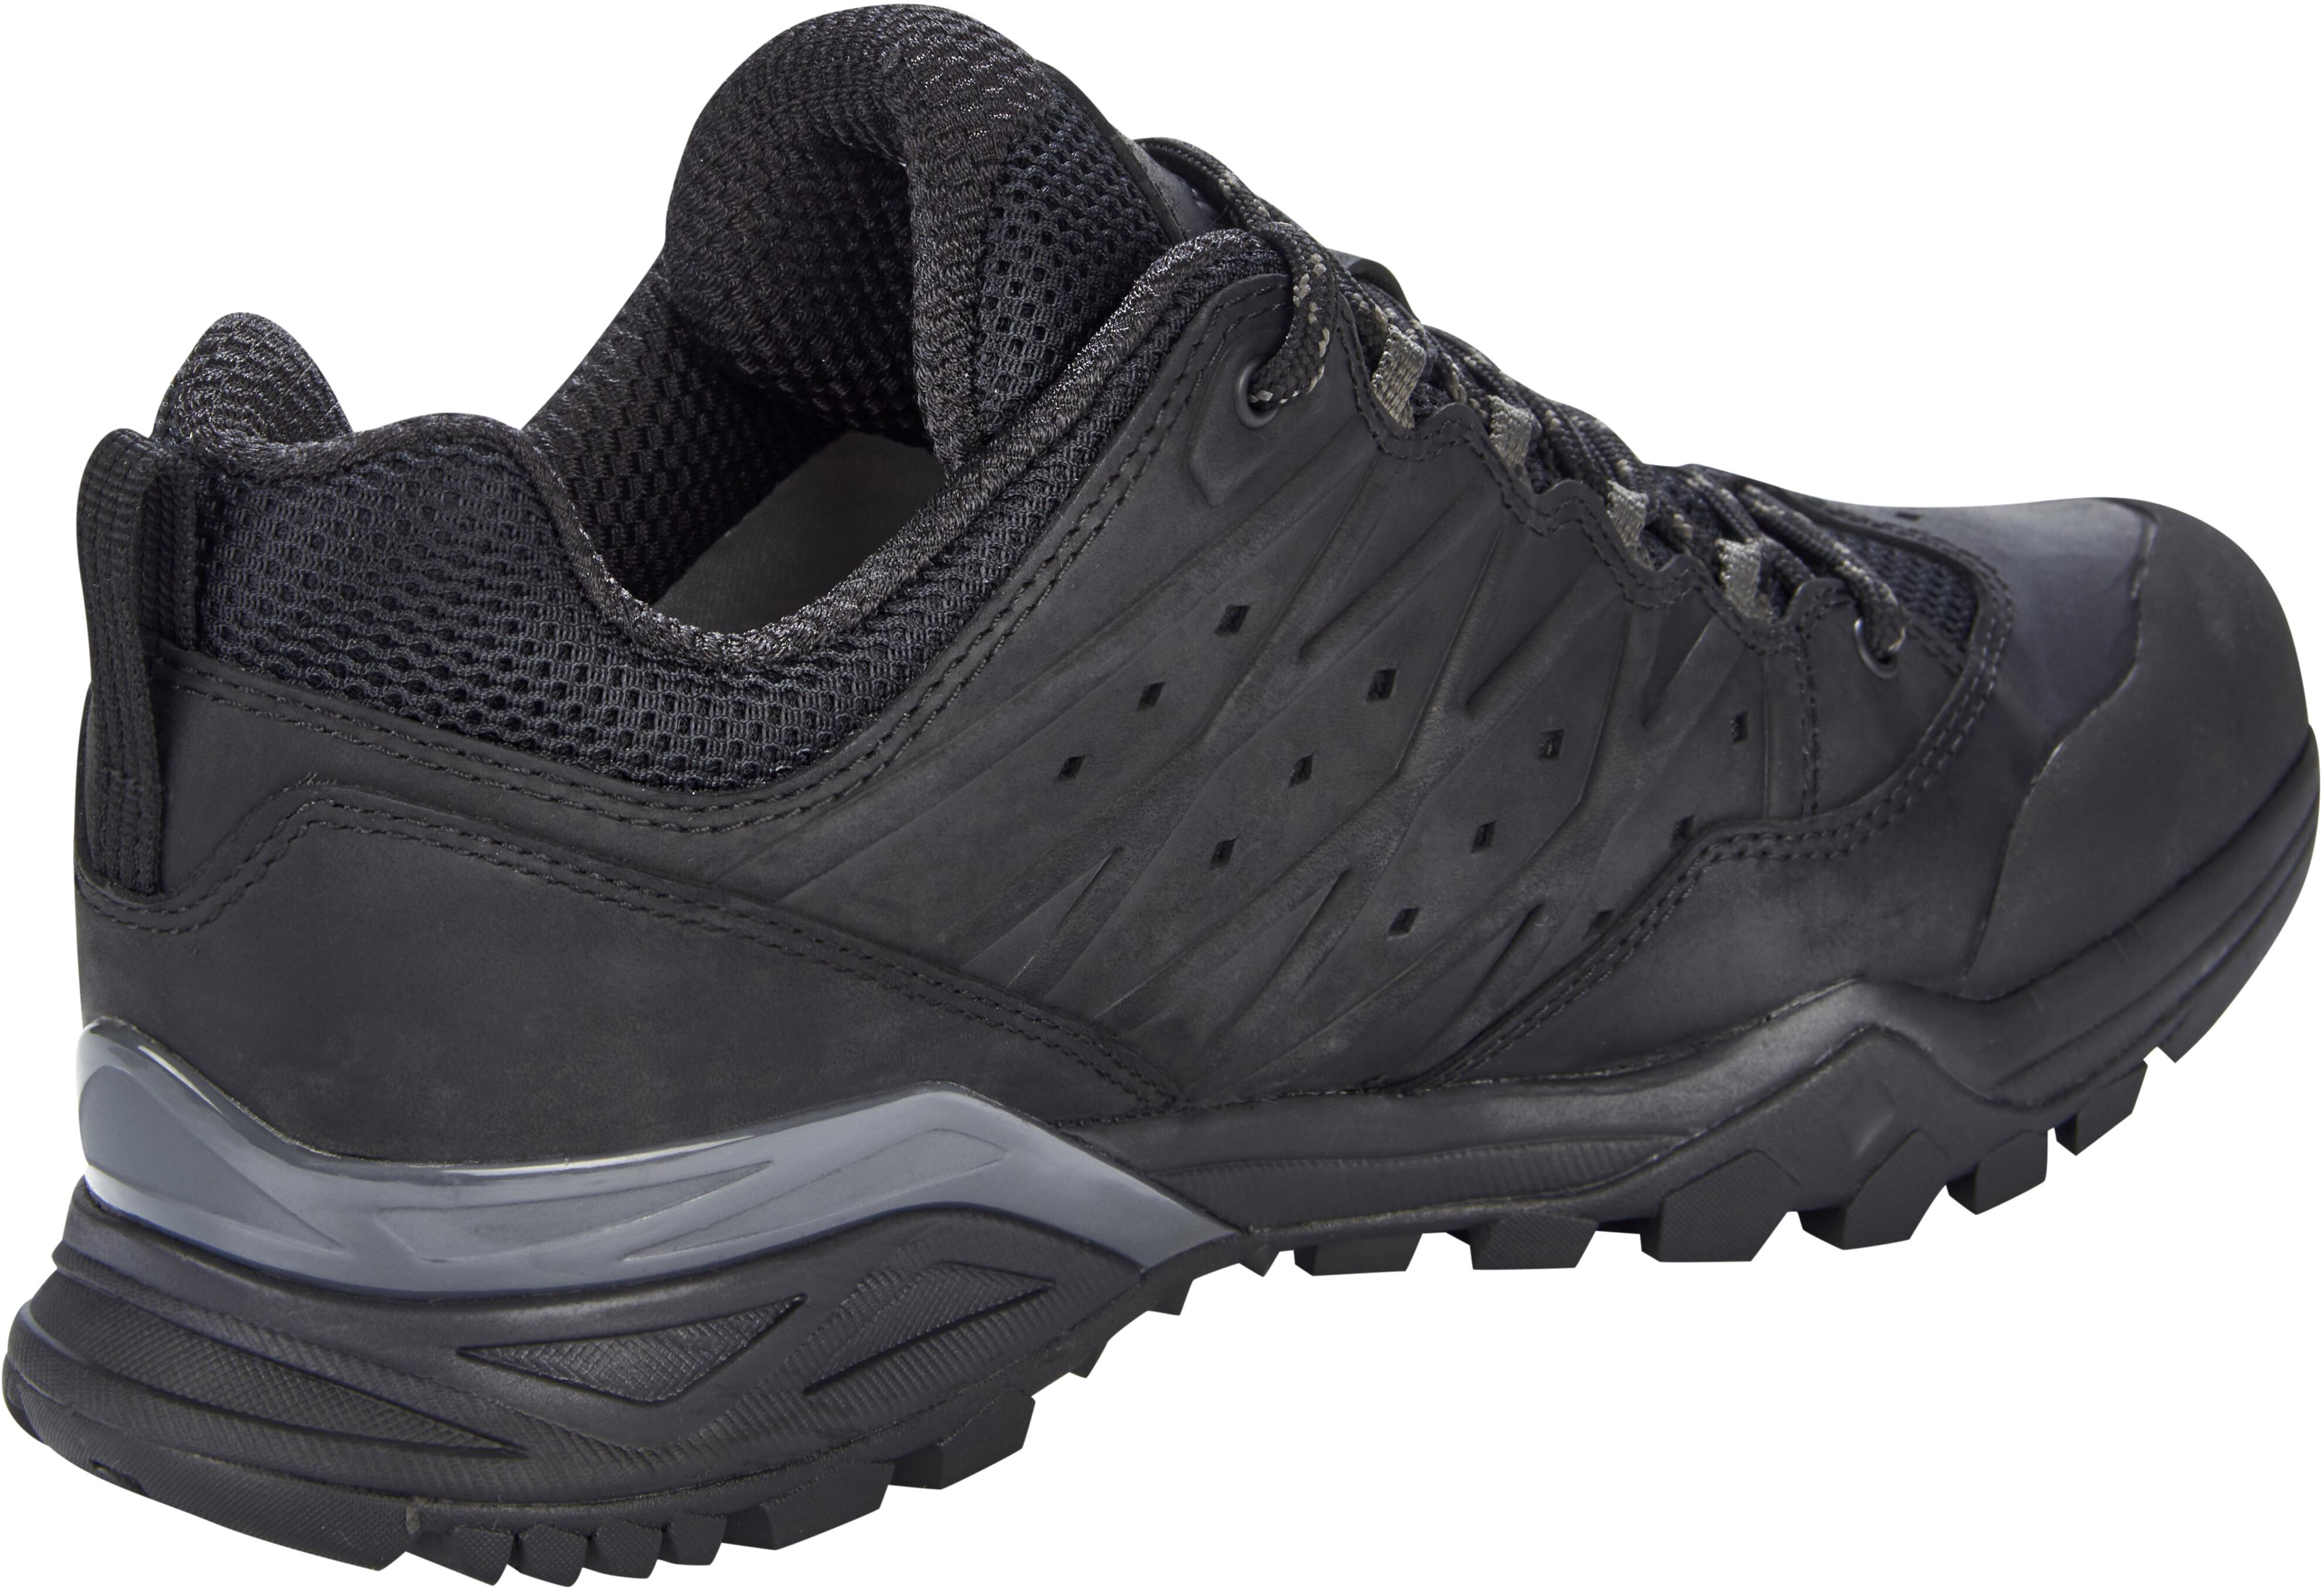 dd96dc738b28 The North Face Hedgehog Hike II GTX Shoes Men black at Addnature.co.uk